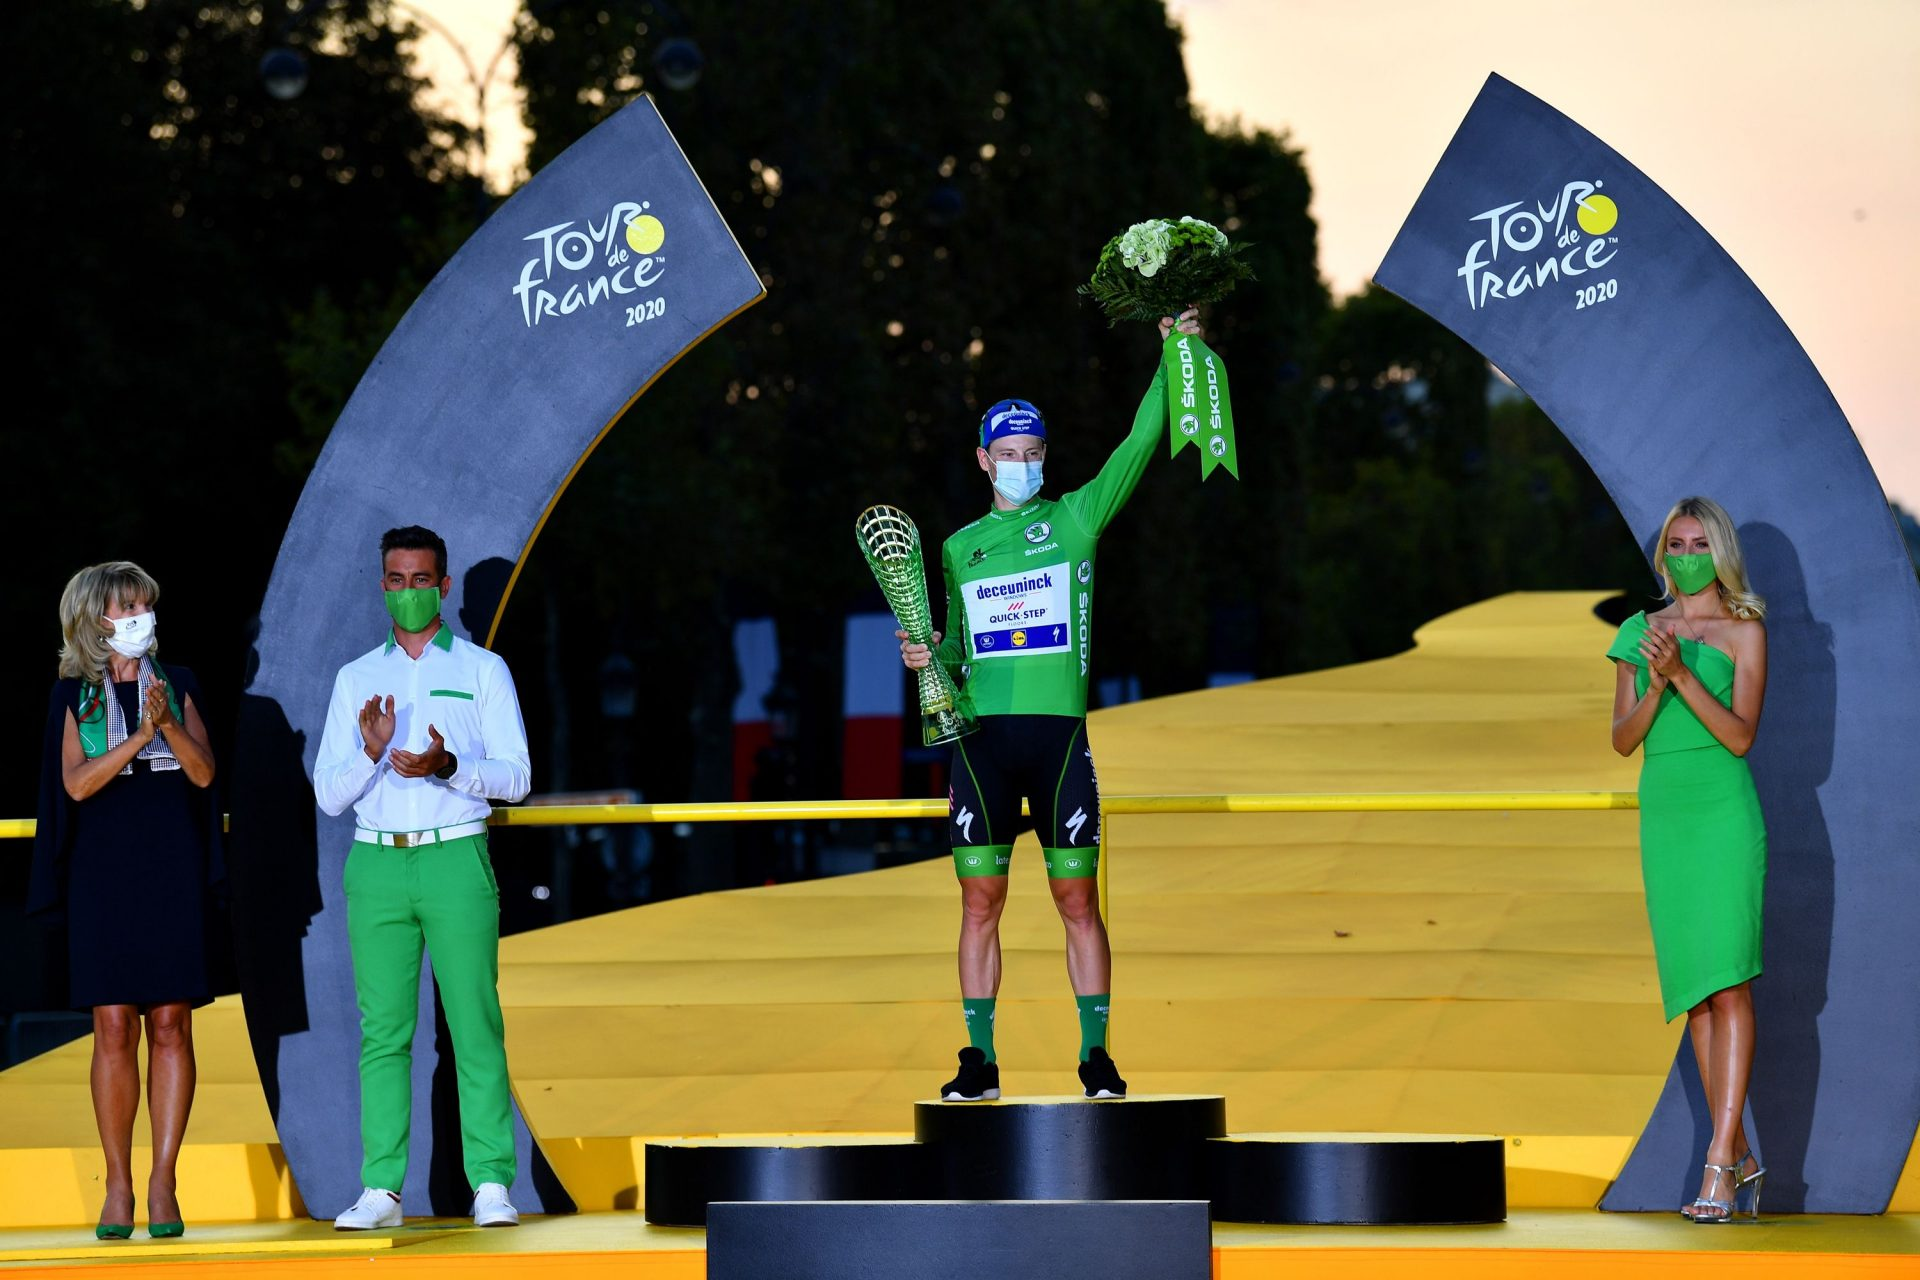 Sam Bennett v zeleném trikotu s trofejí pro vítěze bodovací soutěže Tour de France. Foto: Tim De Waele(Getty Images/Deceuninck Quick Step